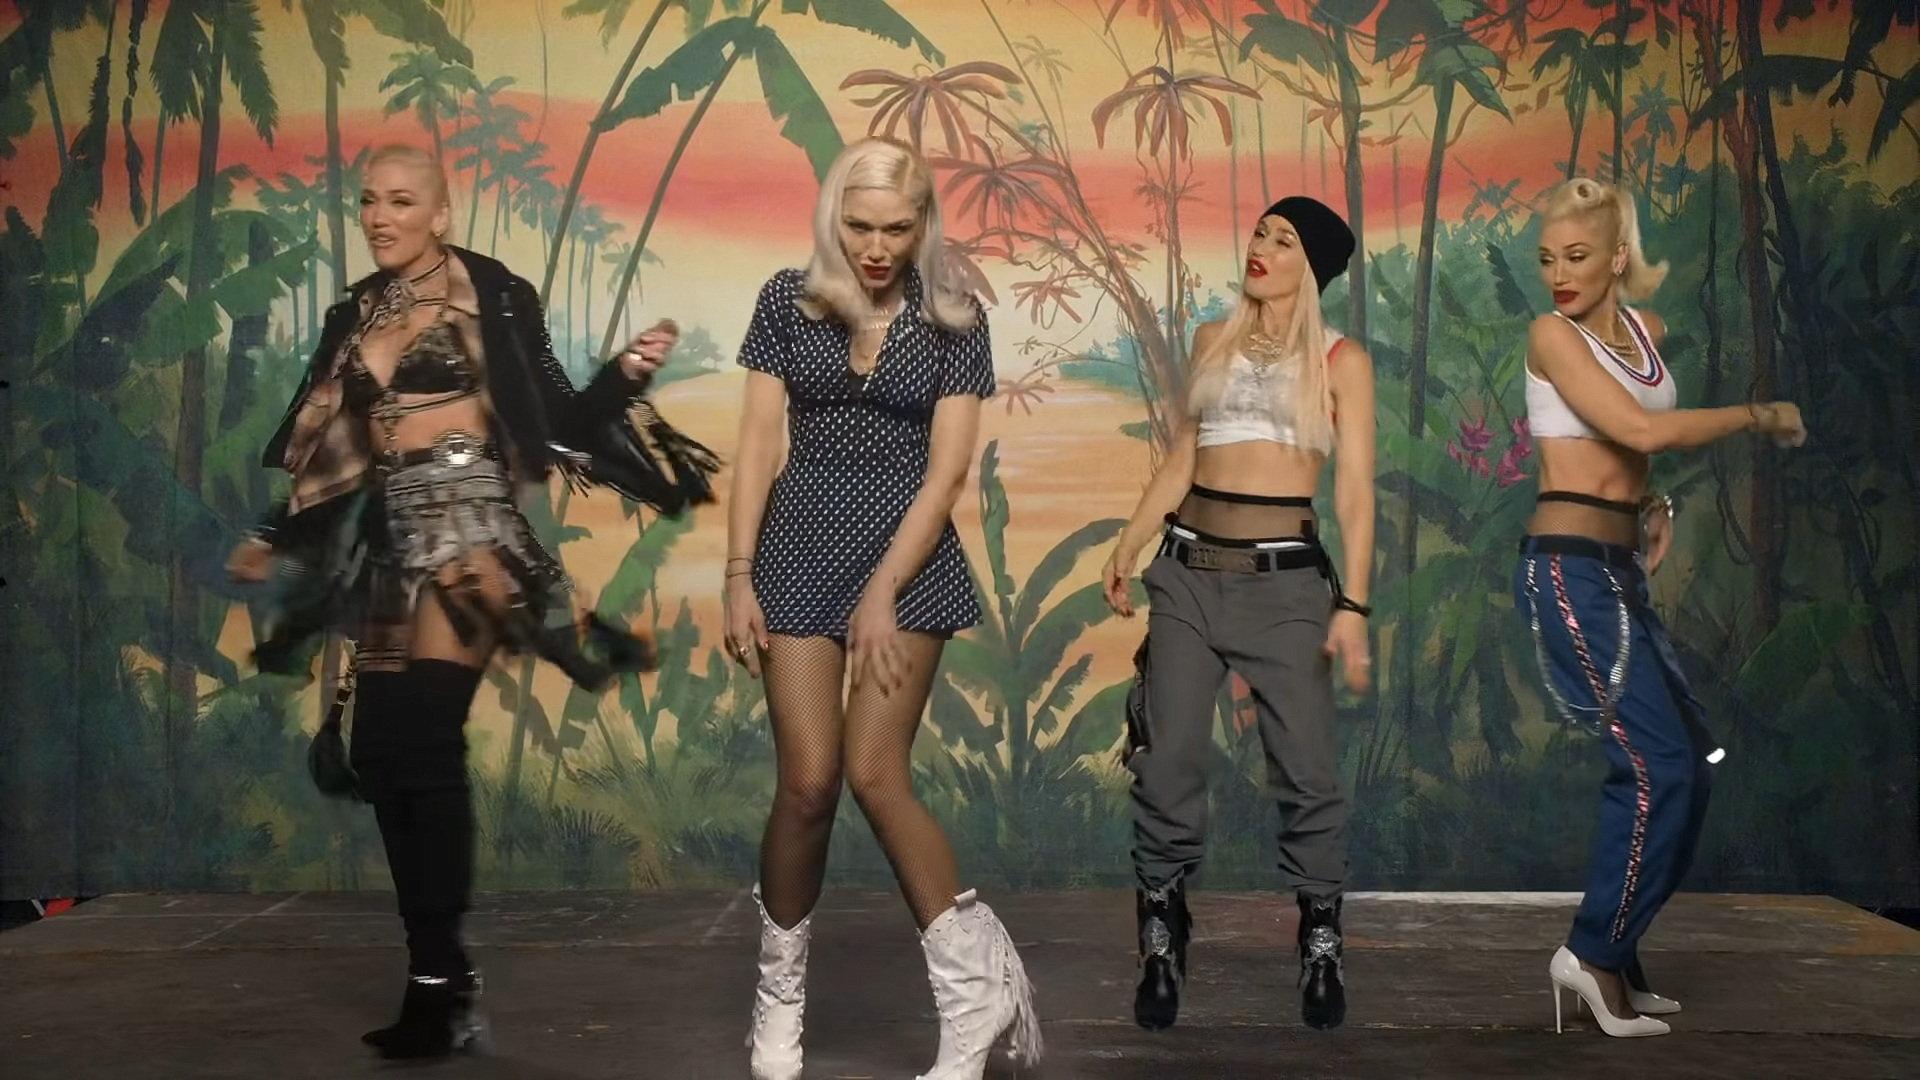 Gwen Stefani - Let Me Reintroduce Myself (Official Video) 3-0 Screenshot